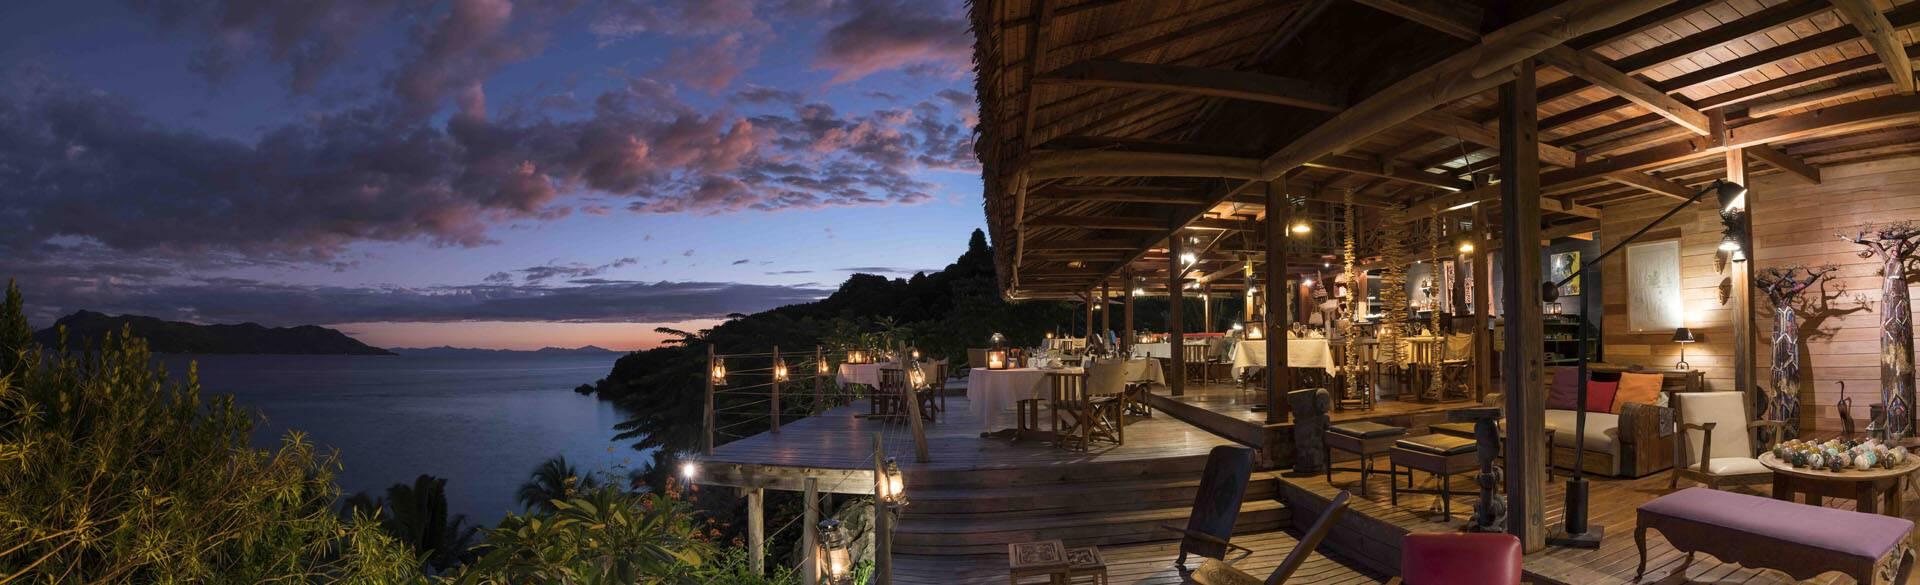 Tsara Komba Lodge Madagascar Restaurant Chassaing